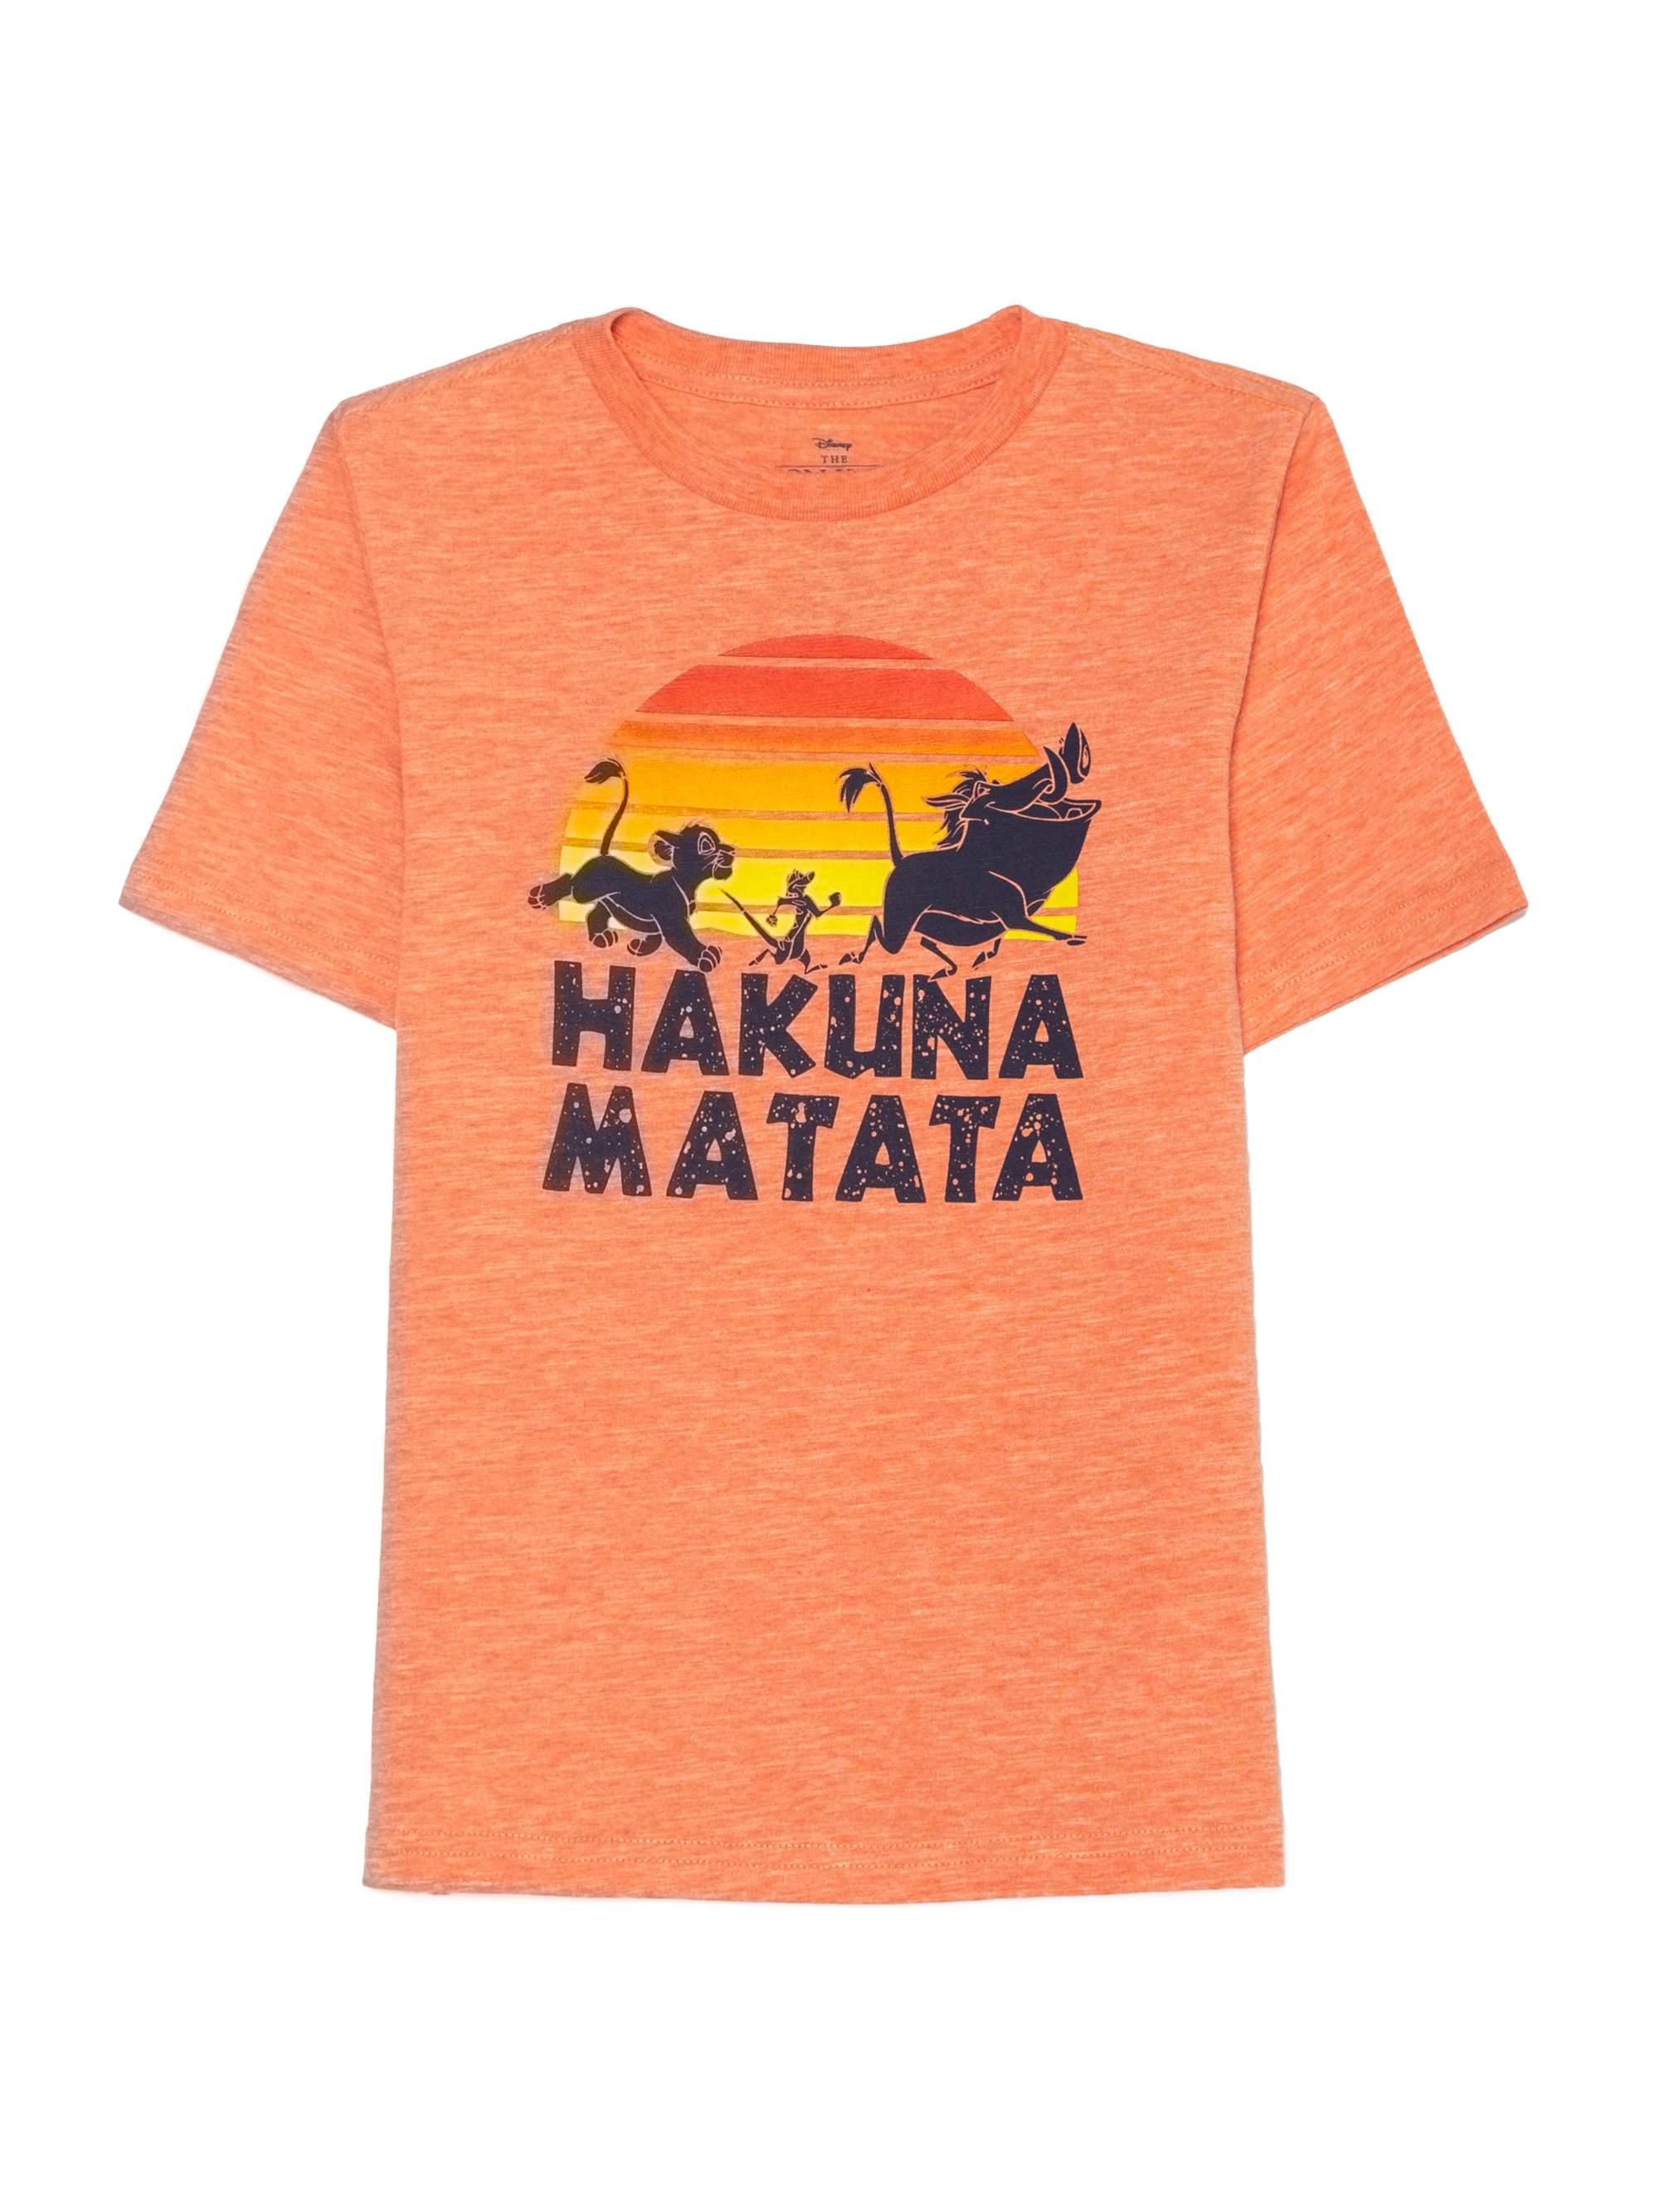 Hakuna Matata Lion King Licensed Graphic Tee (Little Boys & Big Boys)